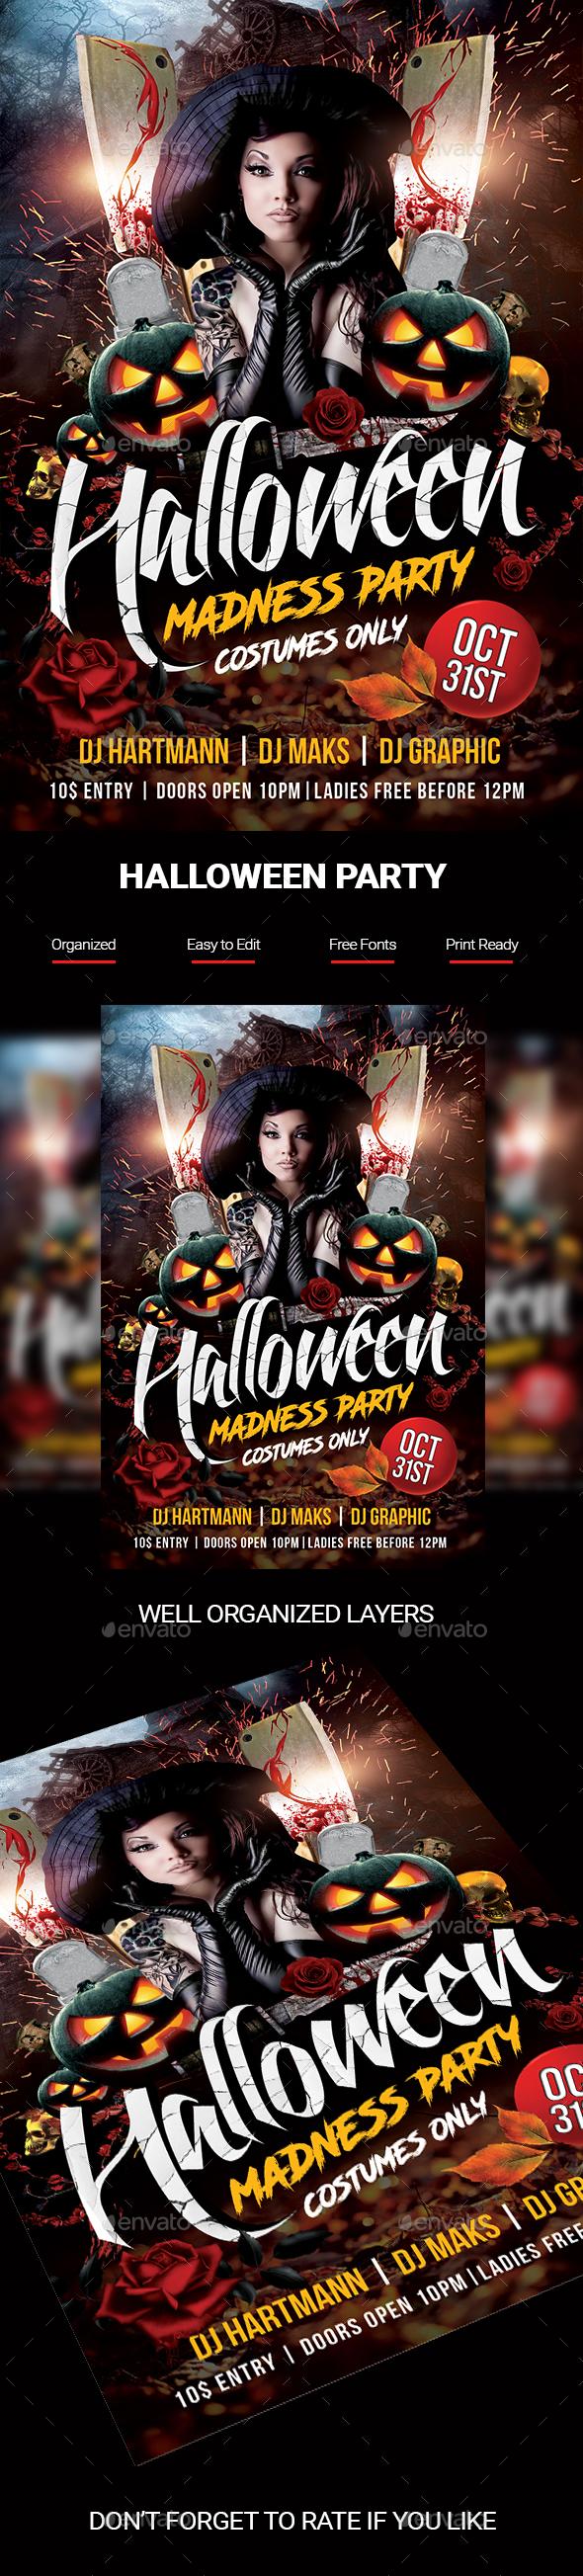 Halloween Madness Flyer